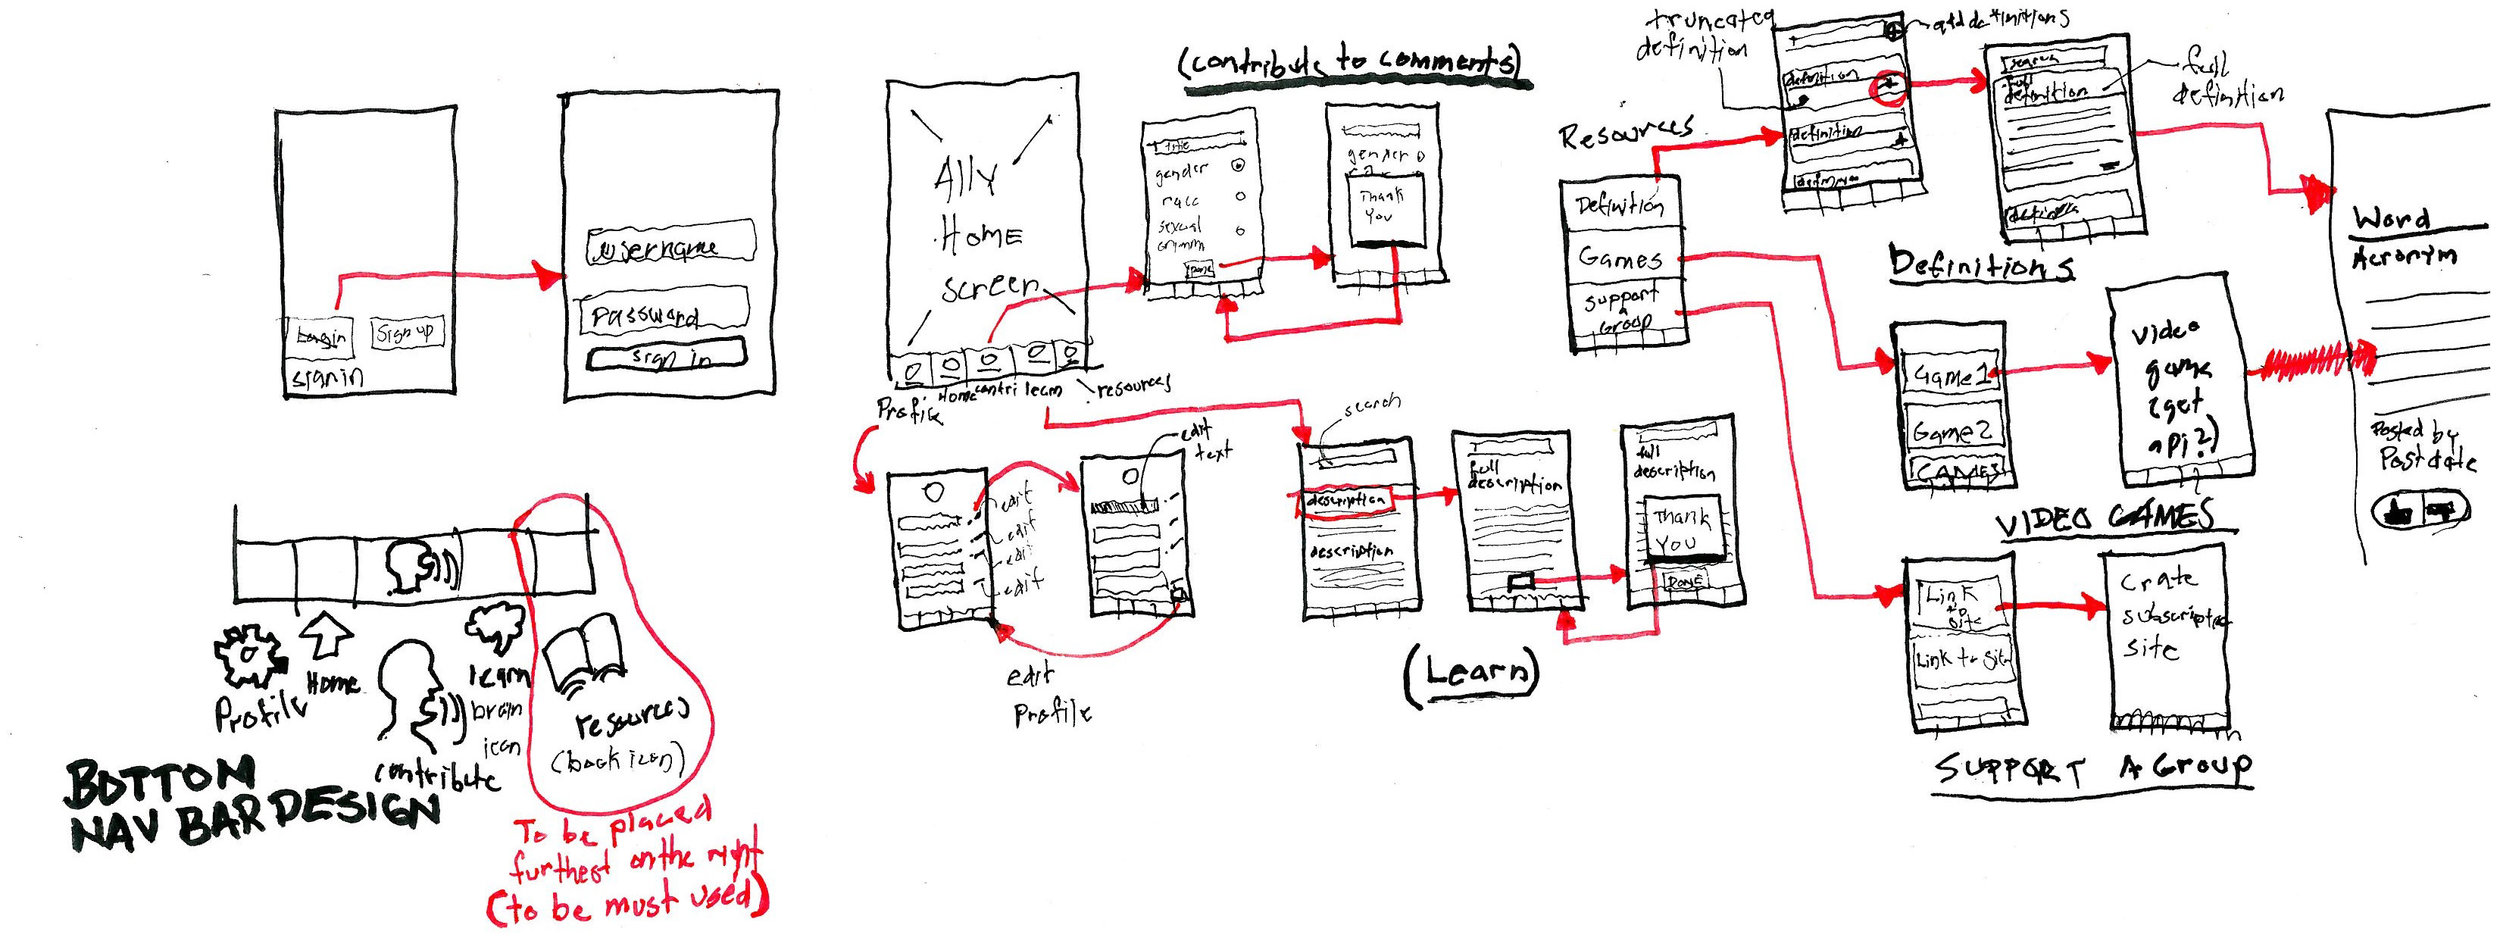 new design sketches4-01.jpg